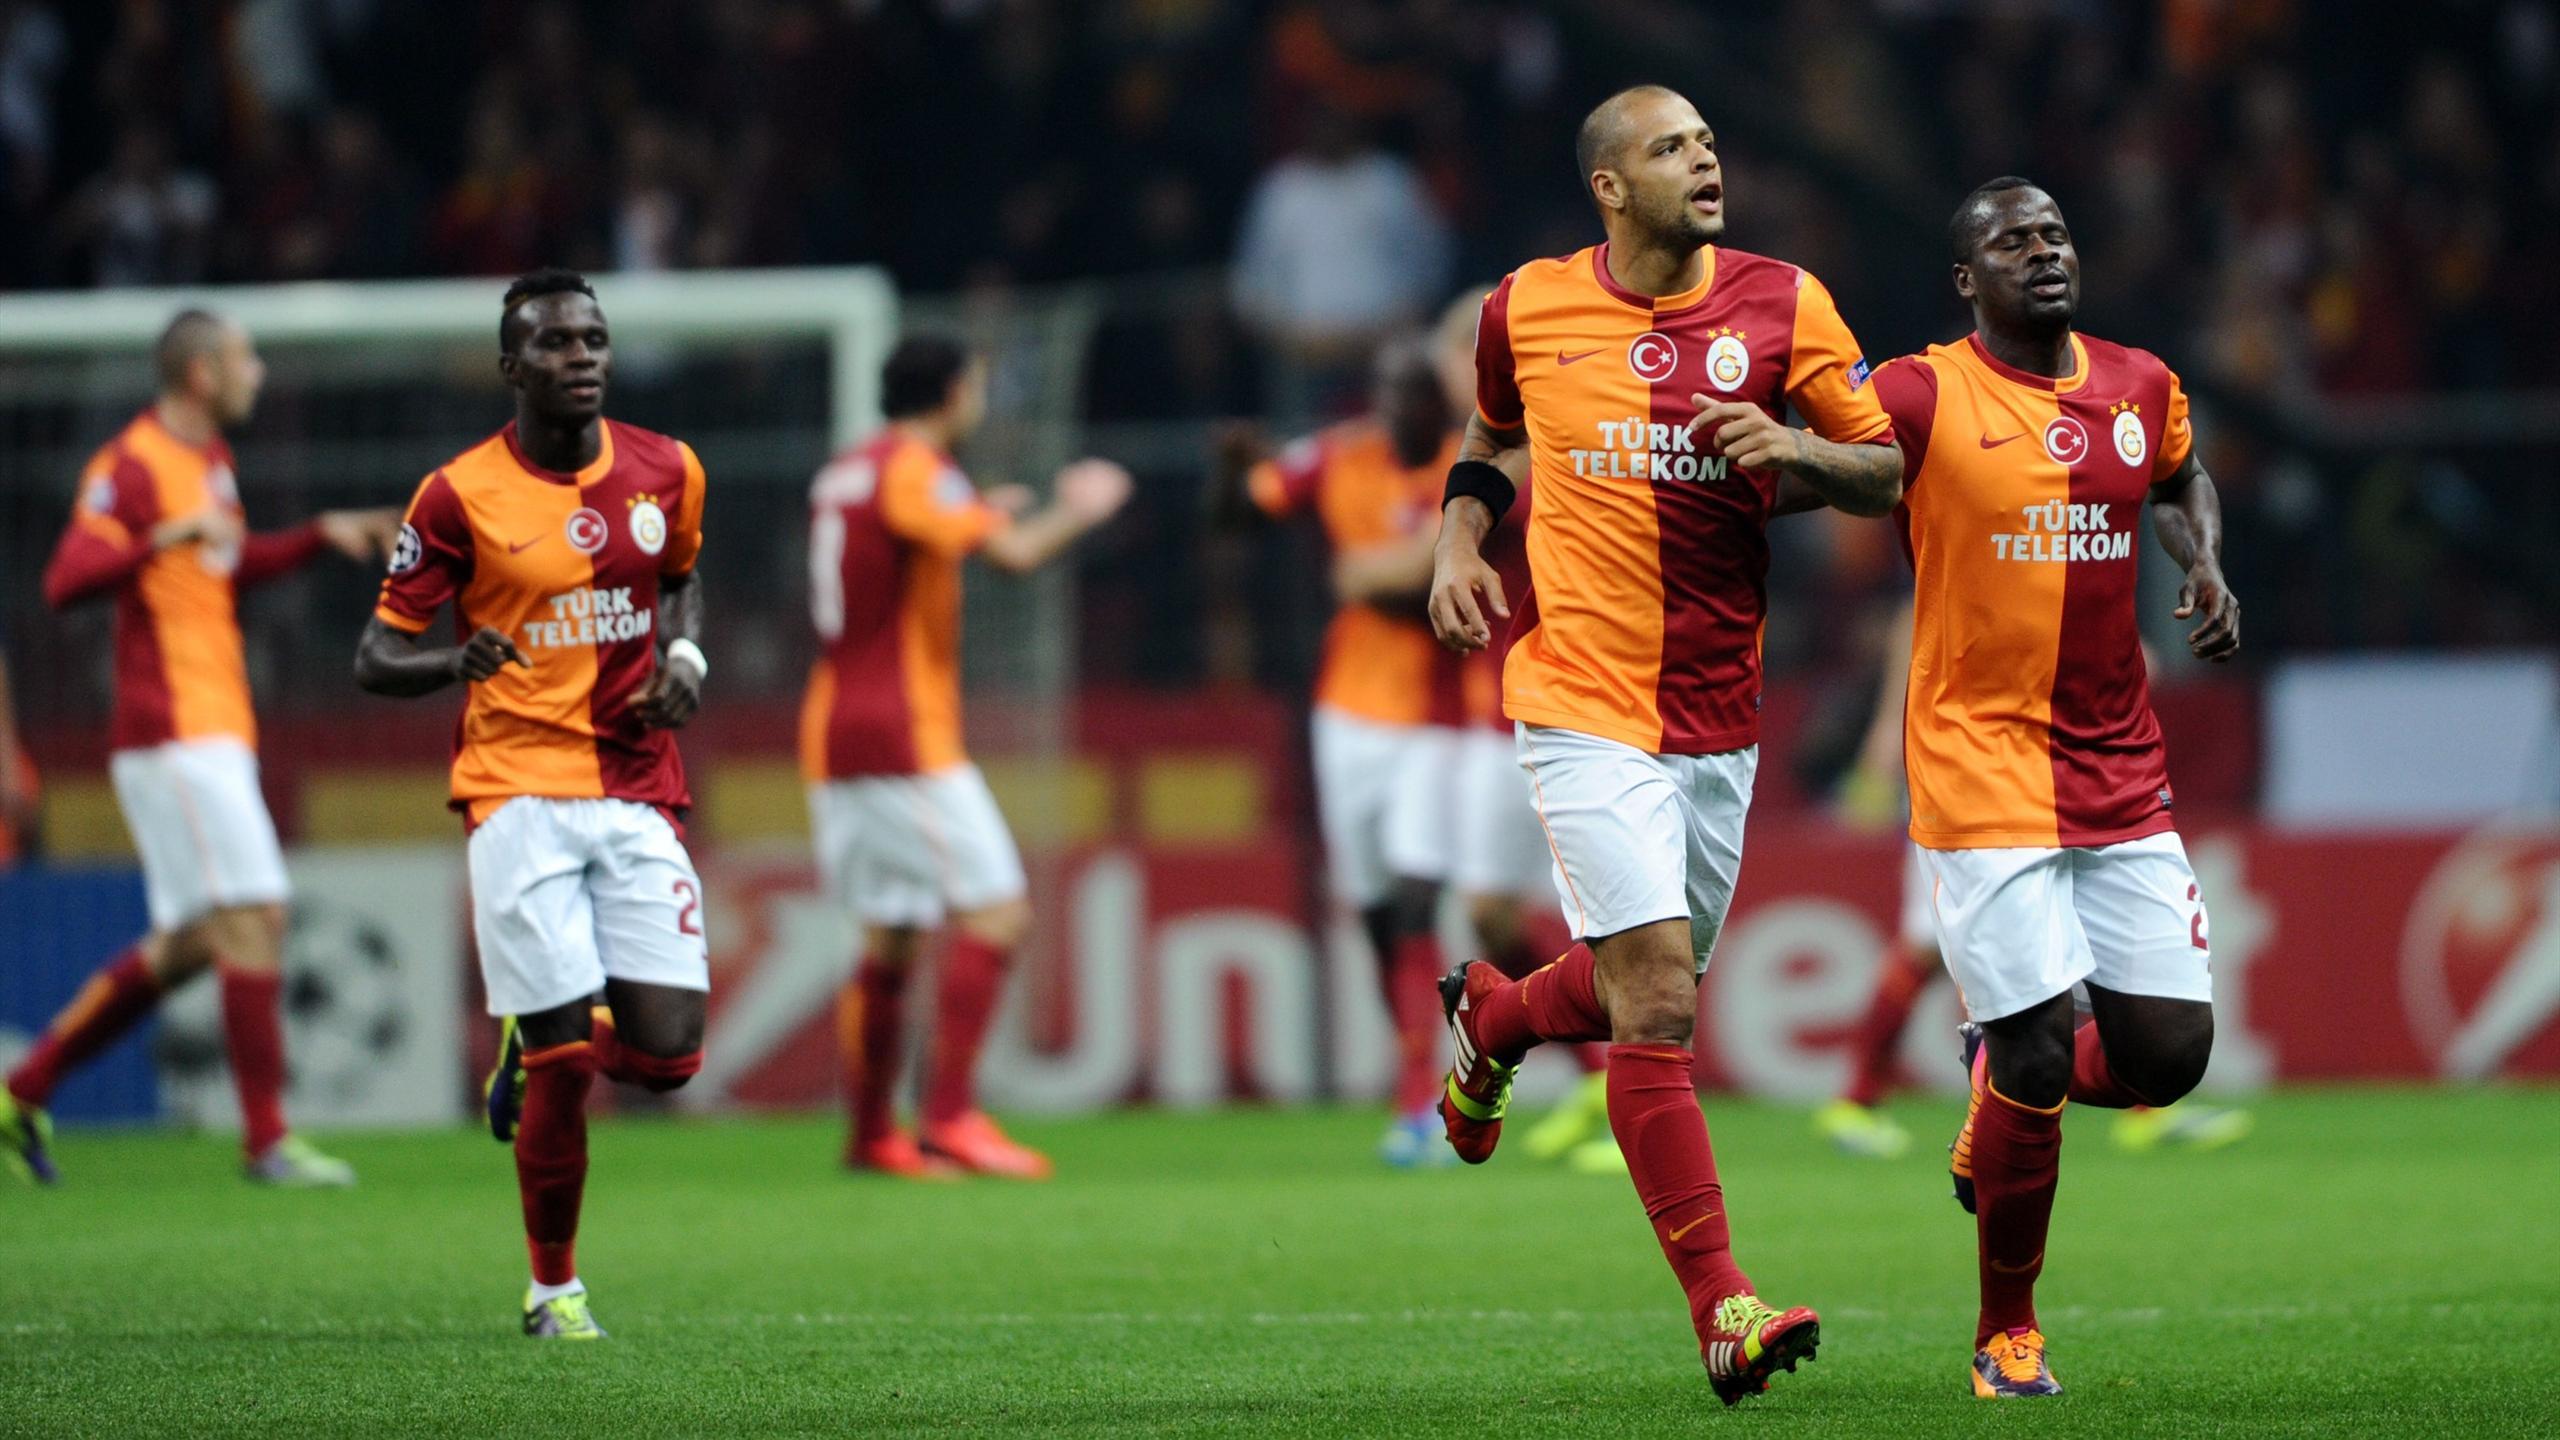 Galatasaray Kayserispor Ma U00e7 U0131 Canl U0131 Izle Lig TV GS Kayseri